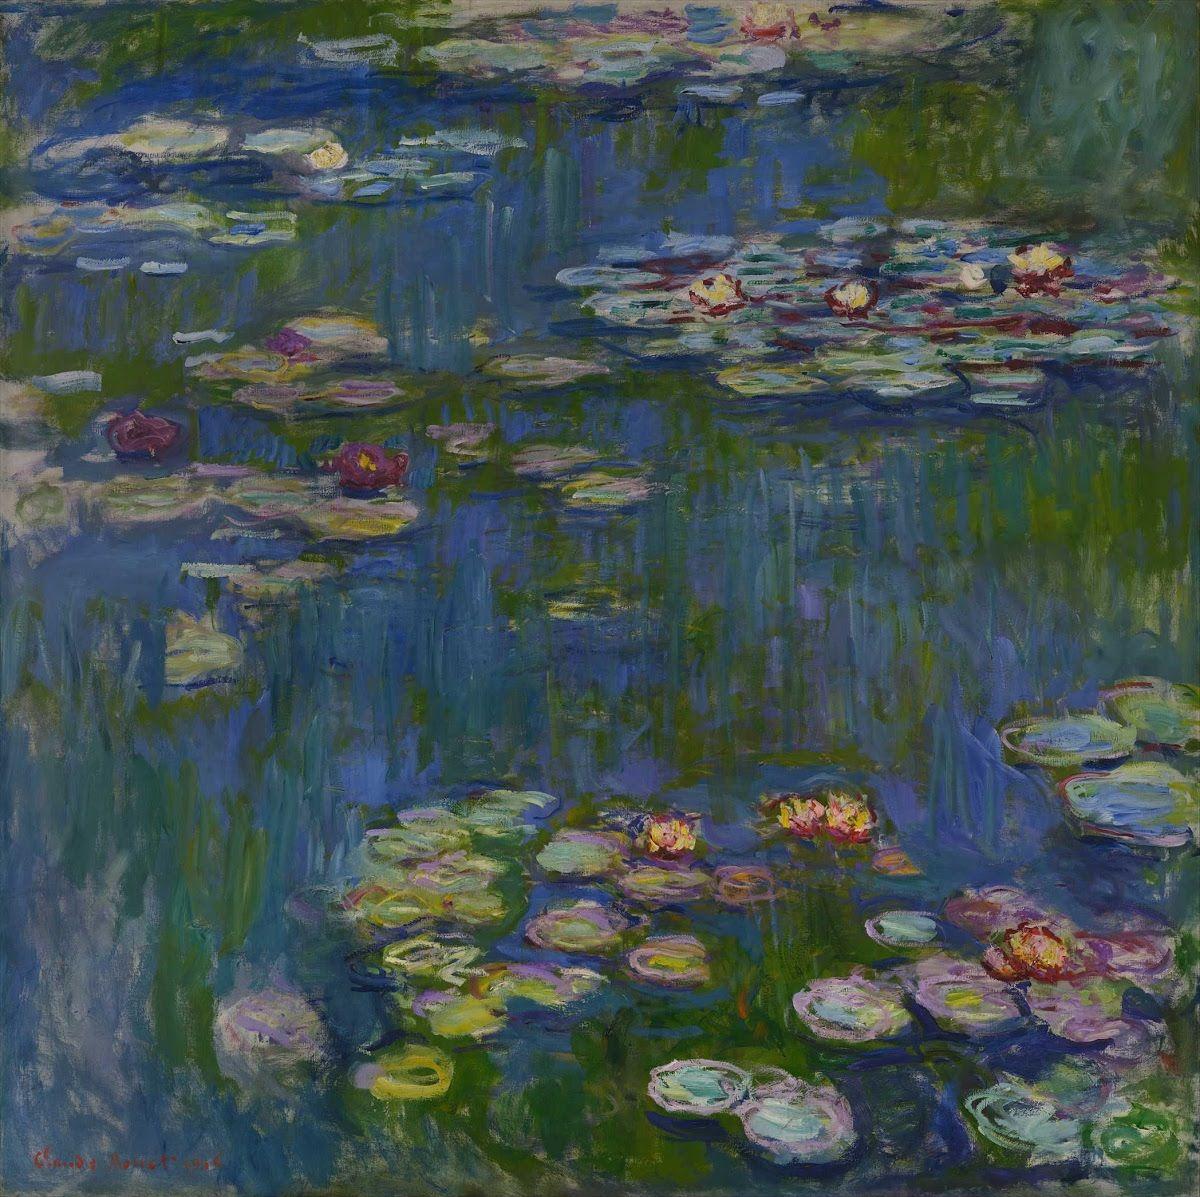 Ninfee, 1918, Claude Monet, Museo nazionale d'arte occidentale, Tokyo |  Dipinti di monet, Arte impressionista, Stampe d'arte